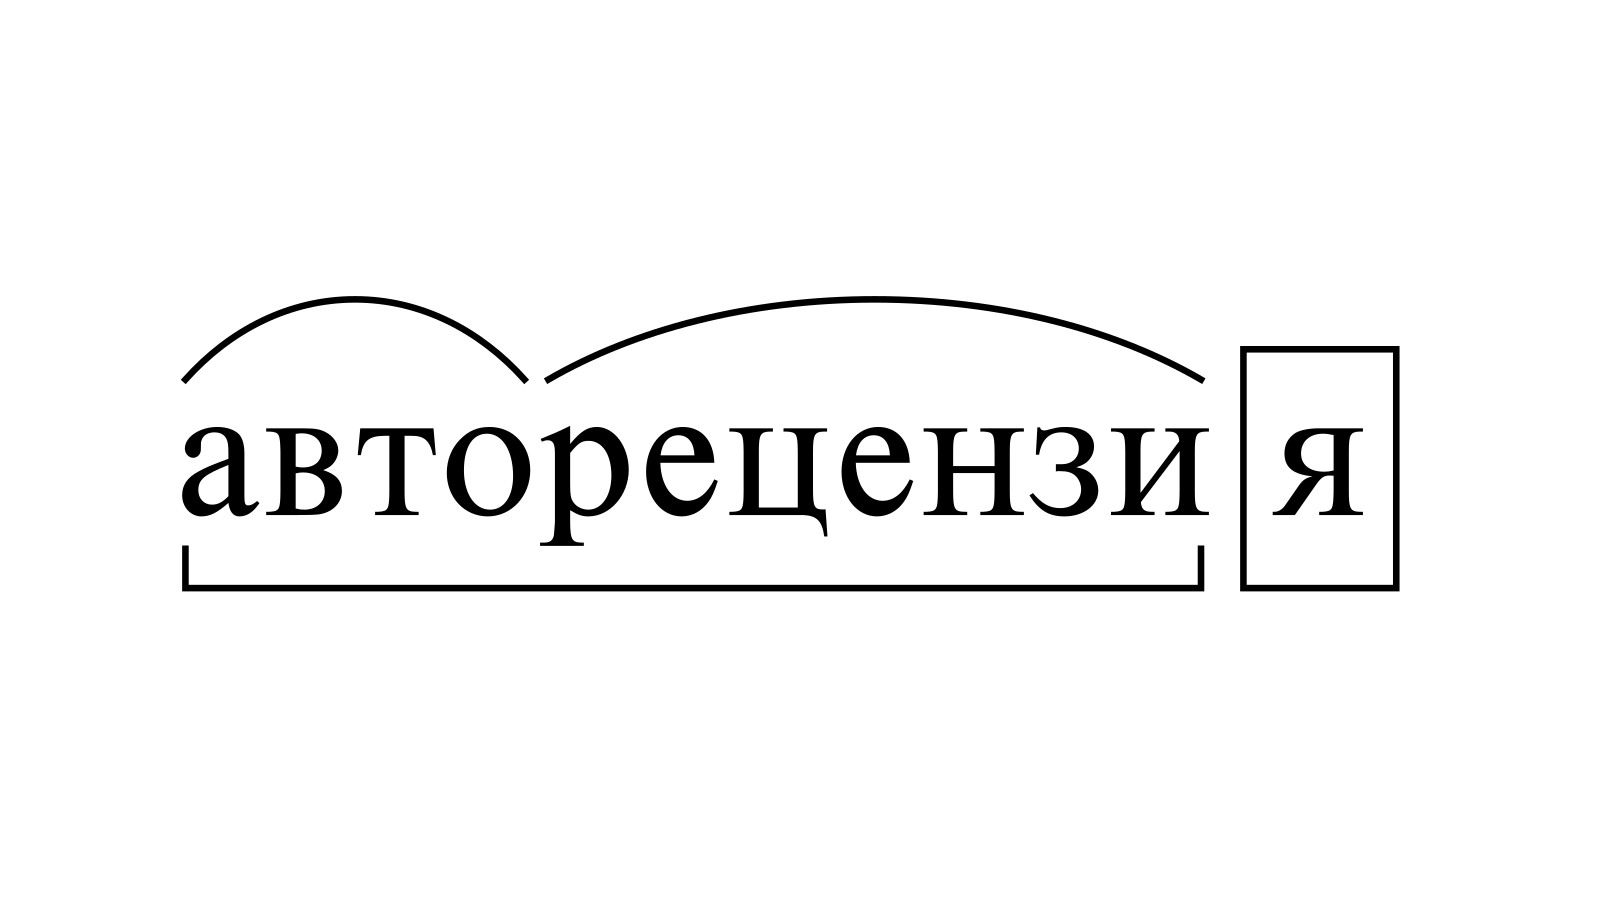 Разбор слова «авторецензия» по составу